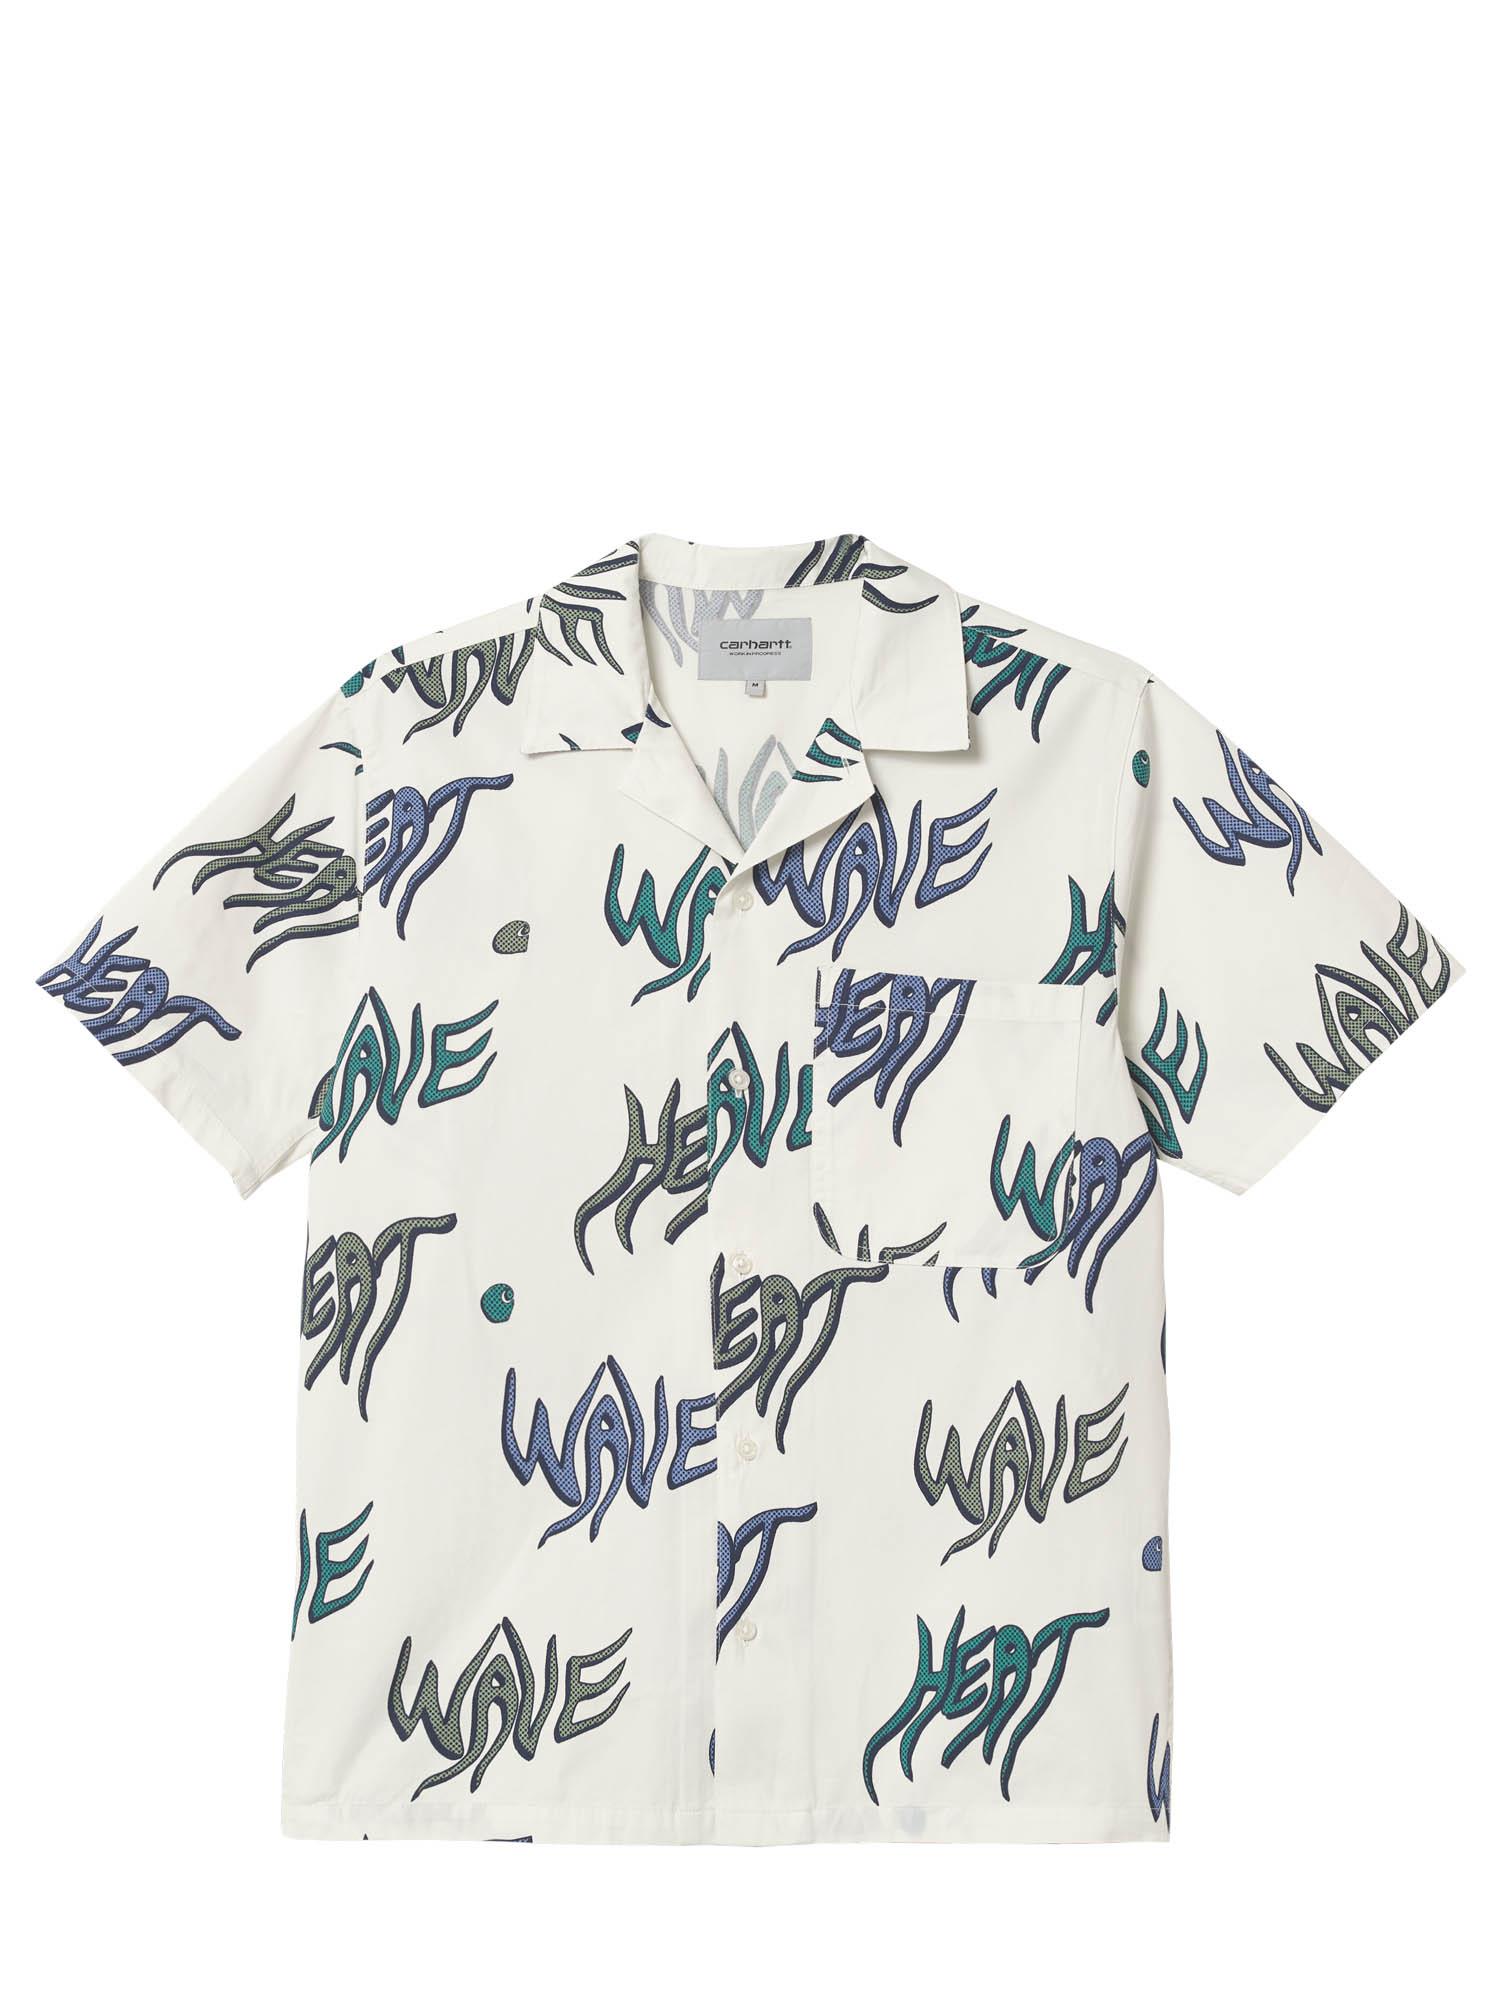 Camicia Carhartt Heat Wave